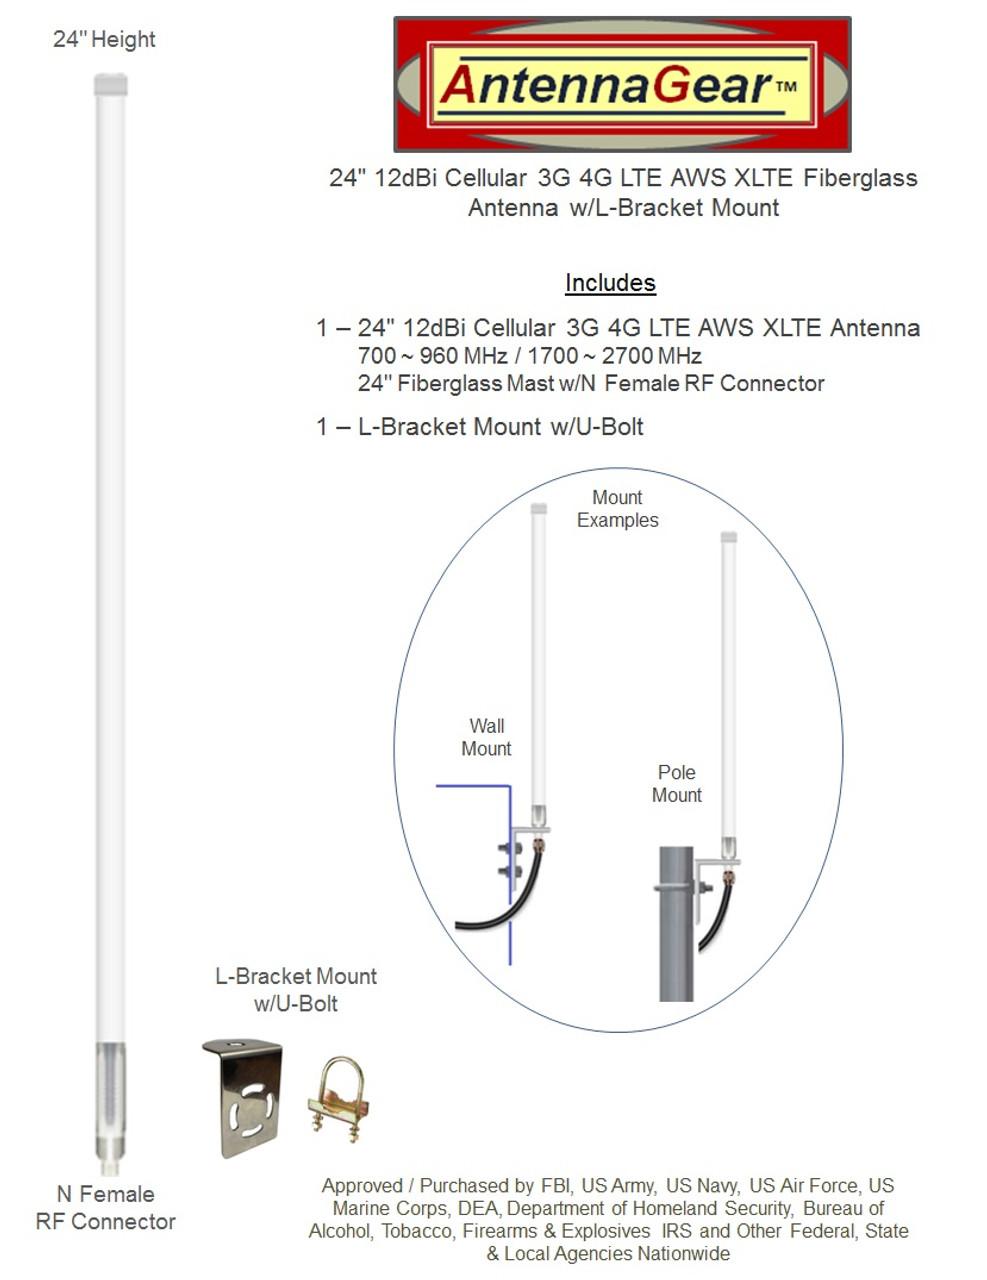 12dB Fiberglass 4G LTE XLTE Antenna Kit for AT&T Netgear Nighthawk M1 MR 1100 w/ Cable Length Options.